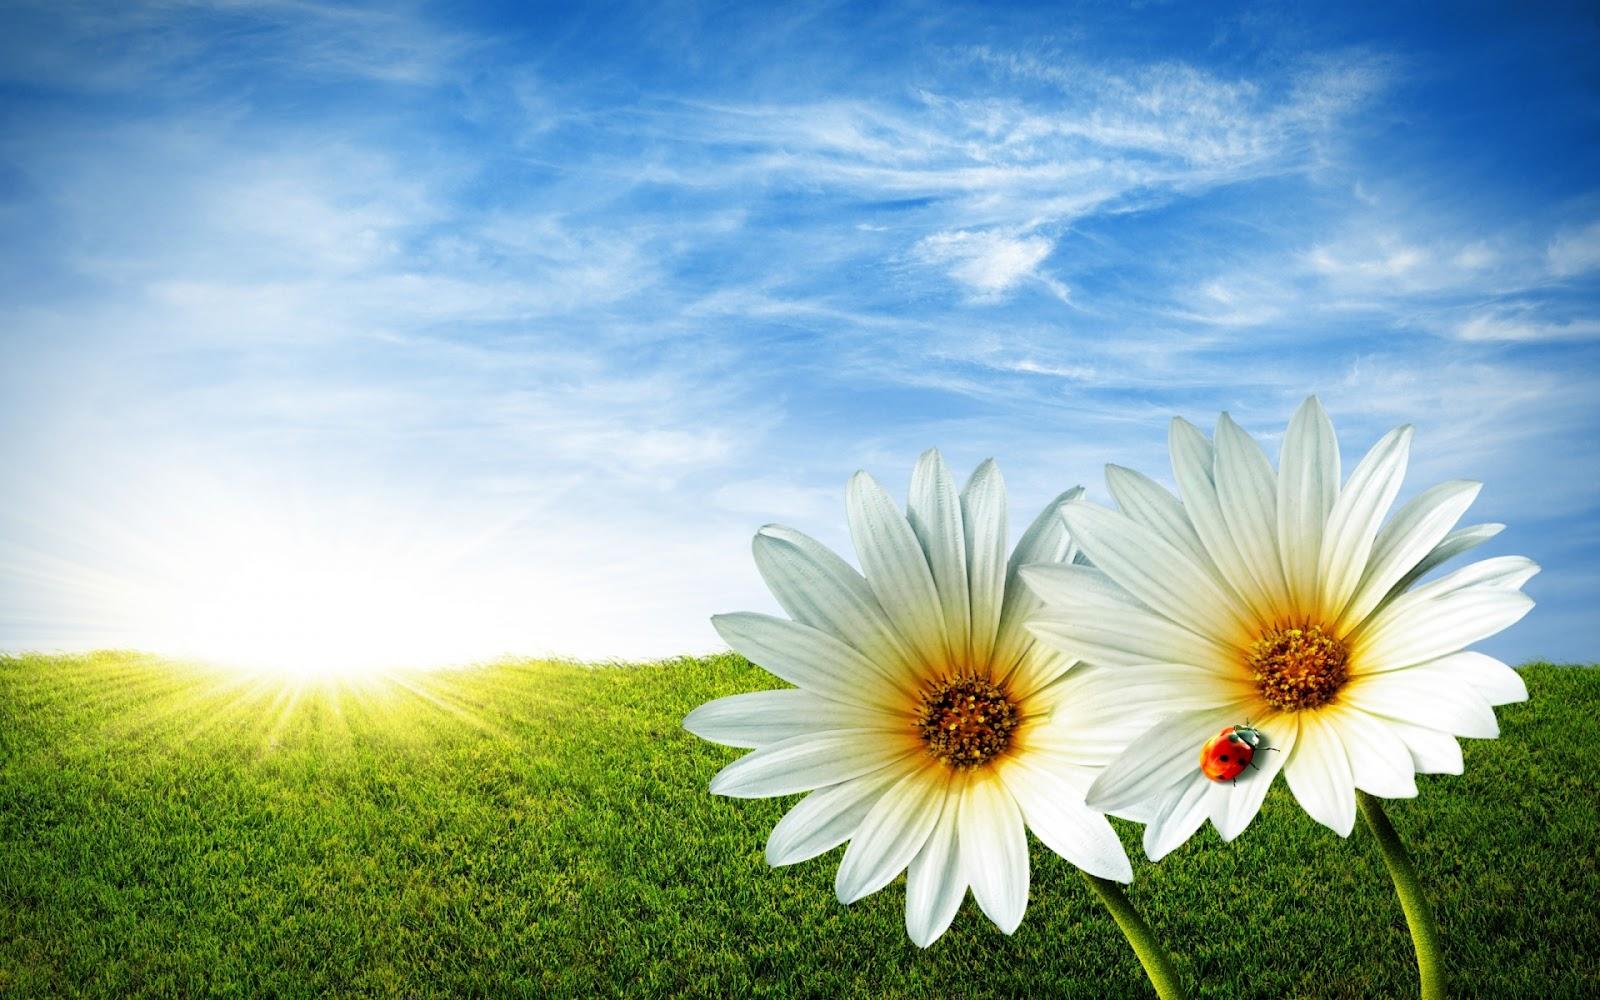 flowers for flower lovers.: Flowers background desktop wallpapers.